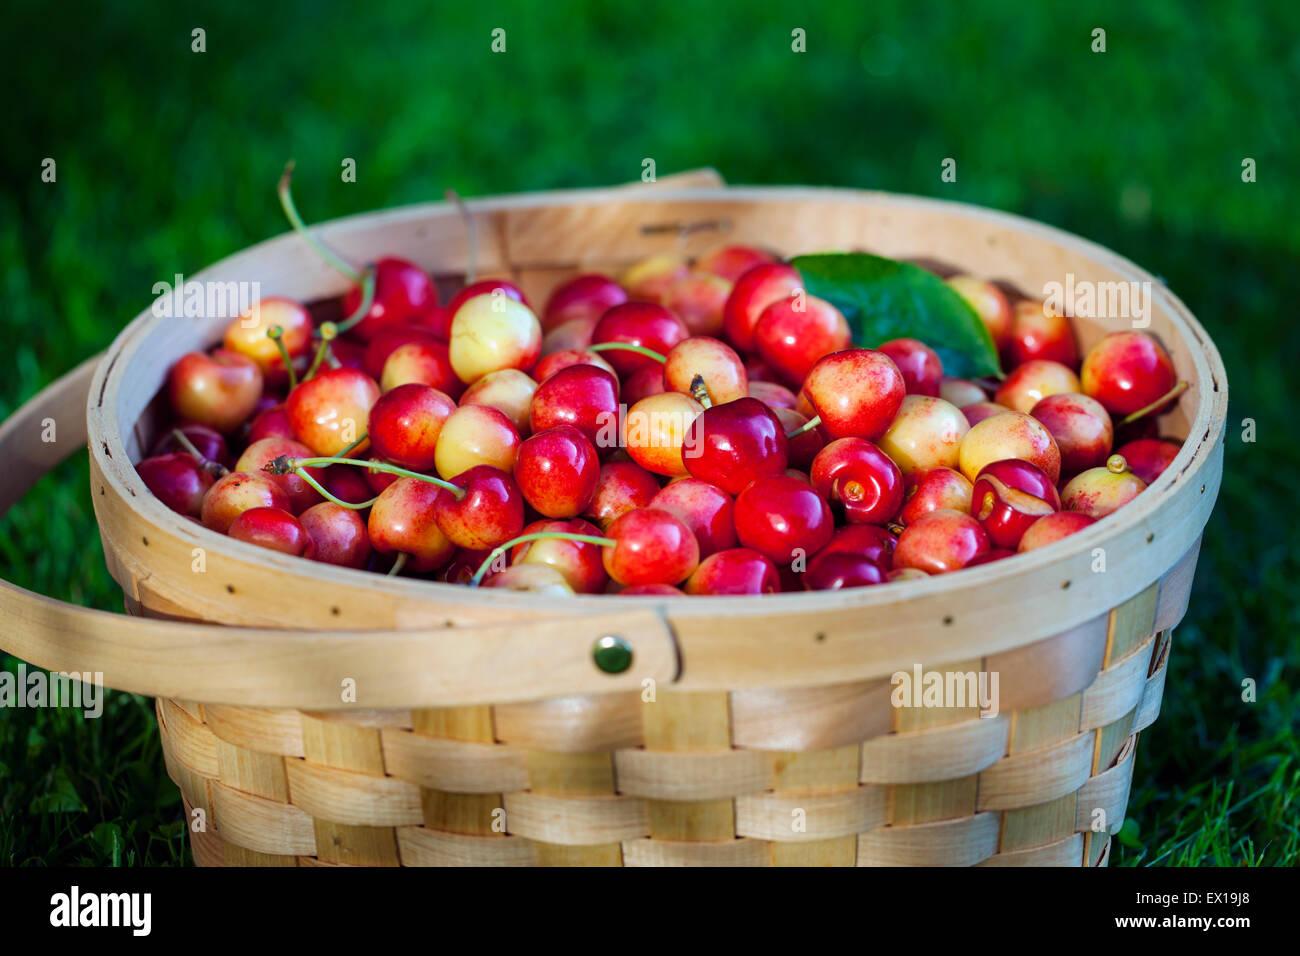 Basket full of sweet cherries Stock Photo